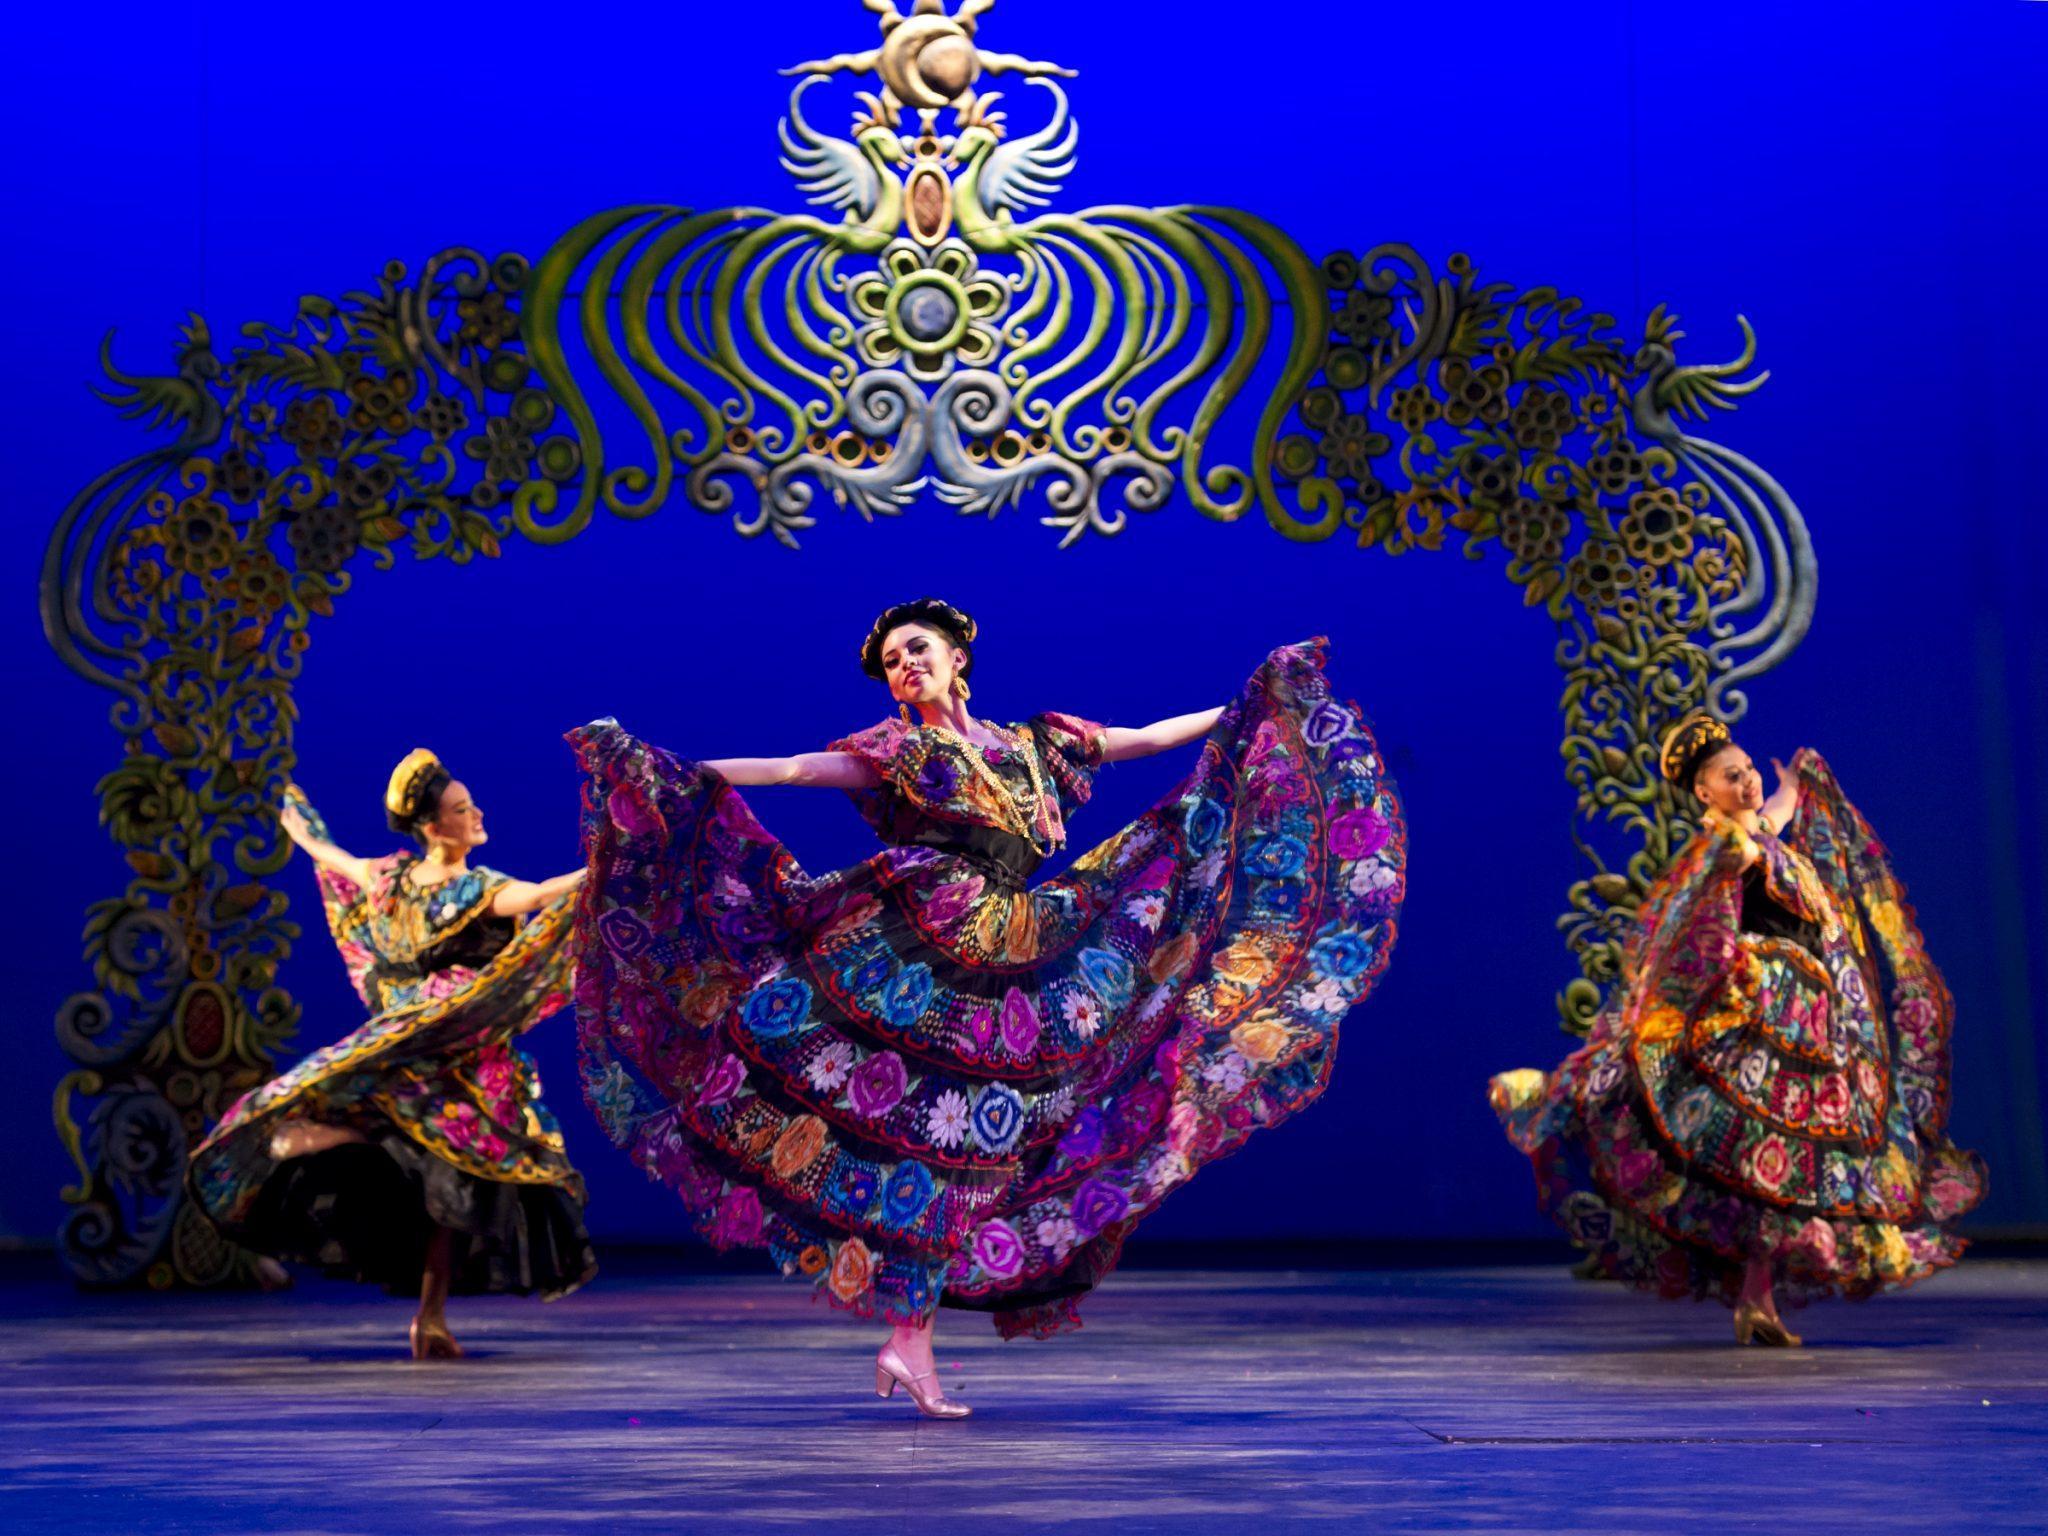 Ballet Folklórico showcases Mexican culture to educate public